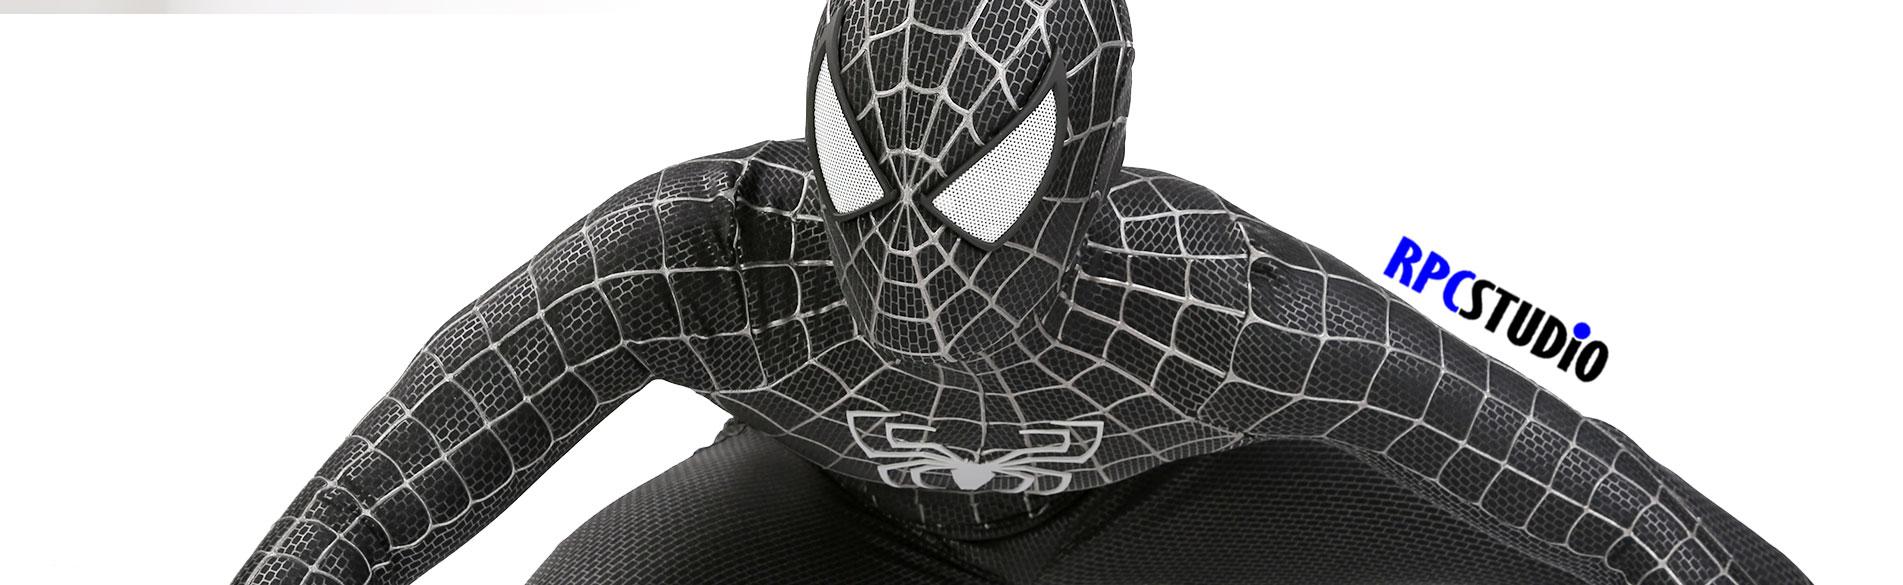 Rpcpaint Symbiote